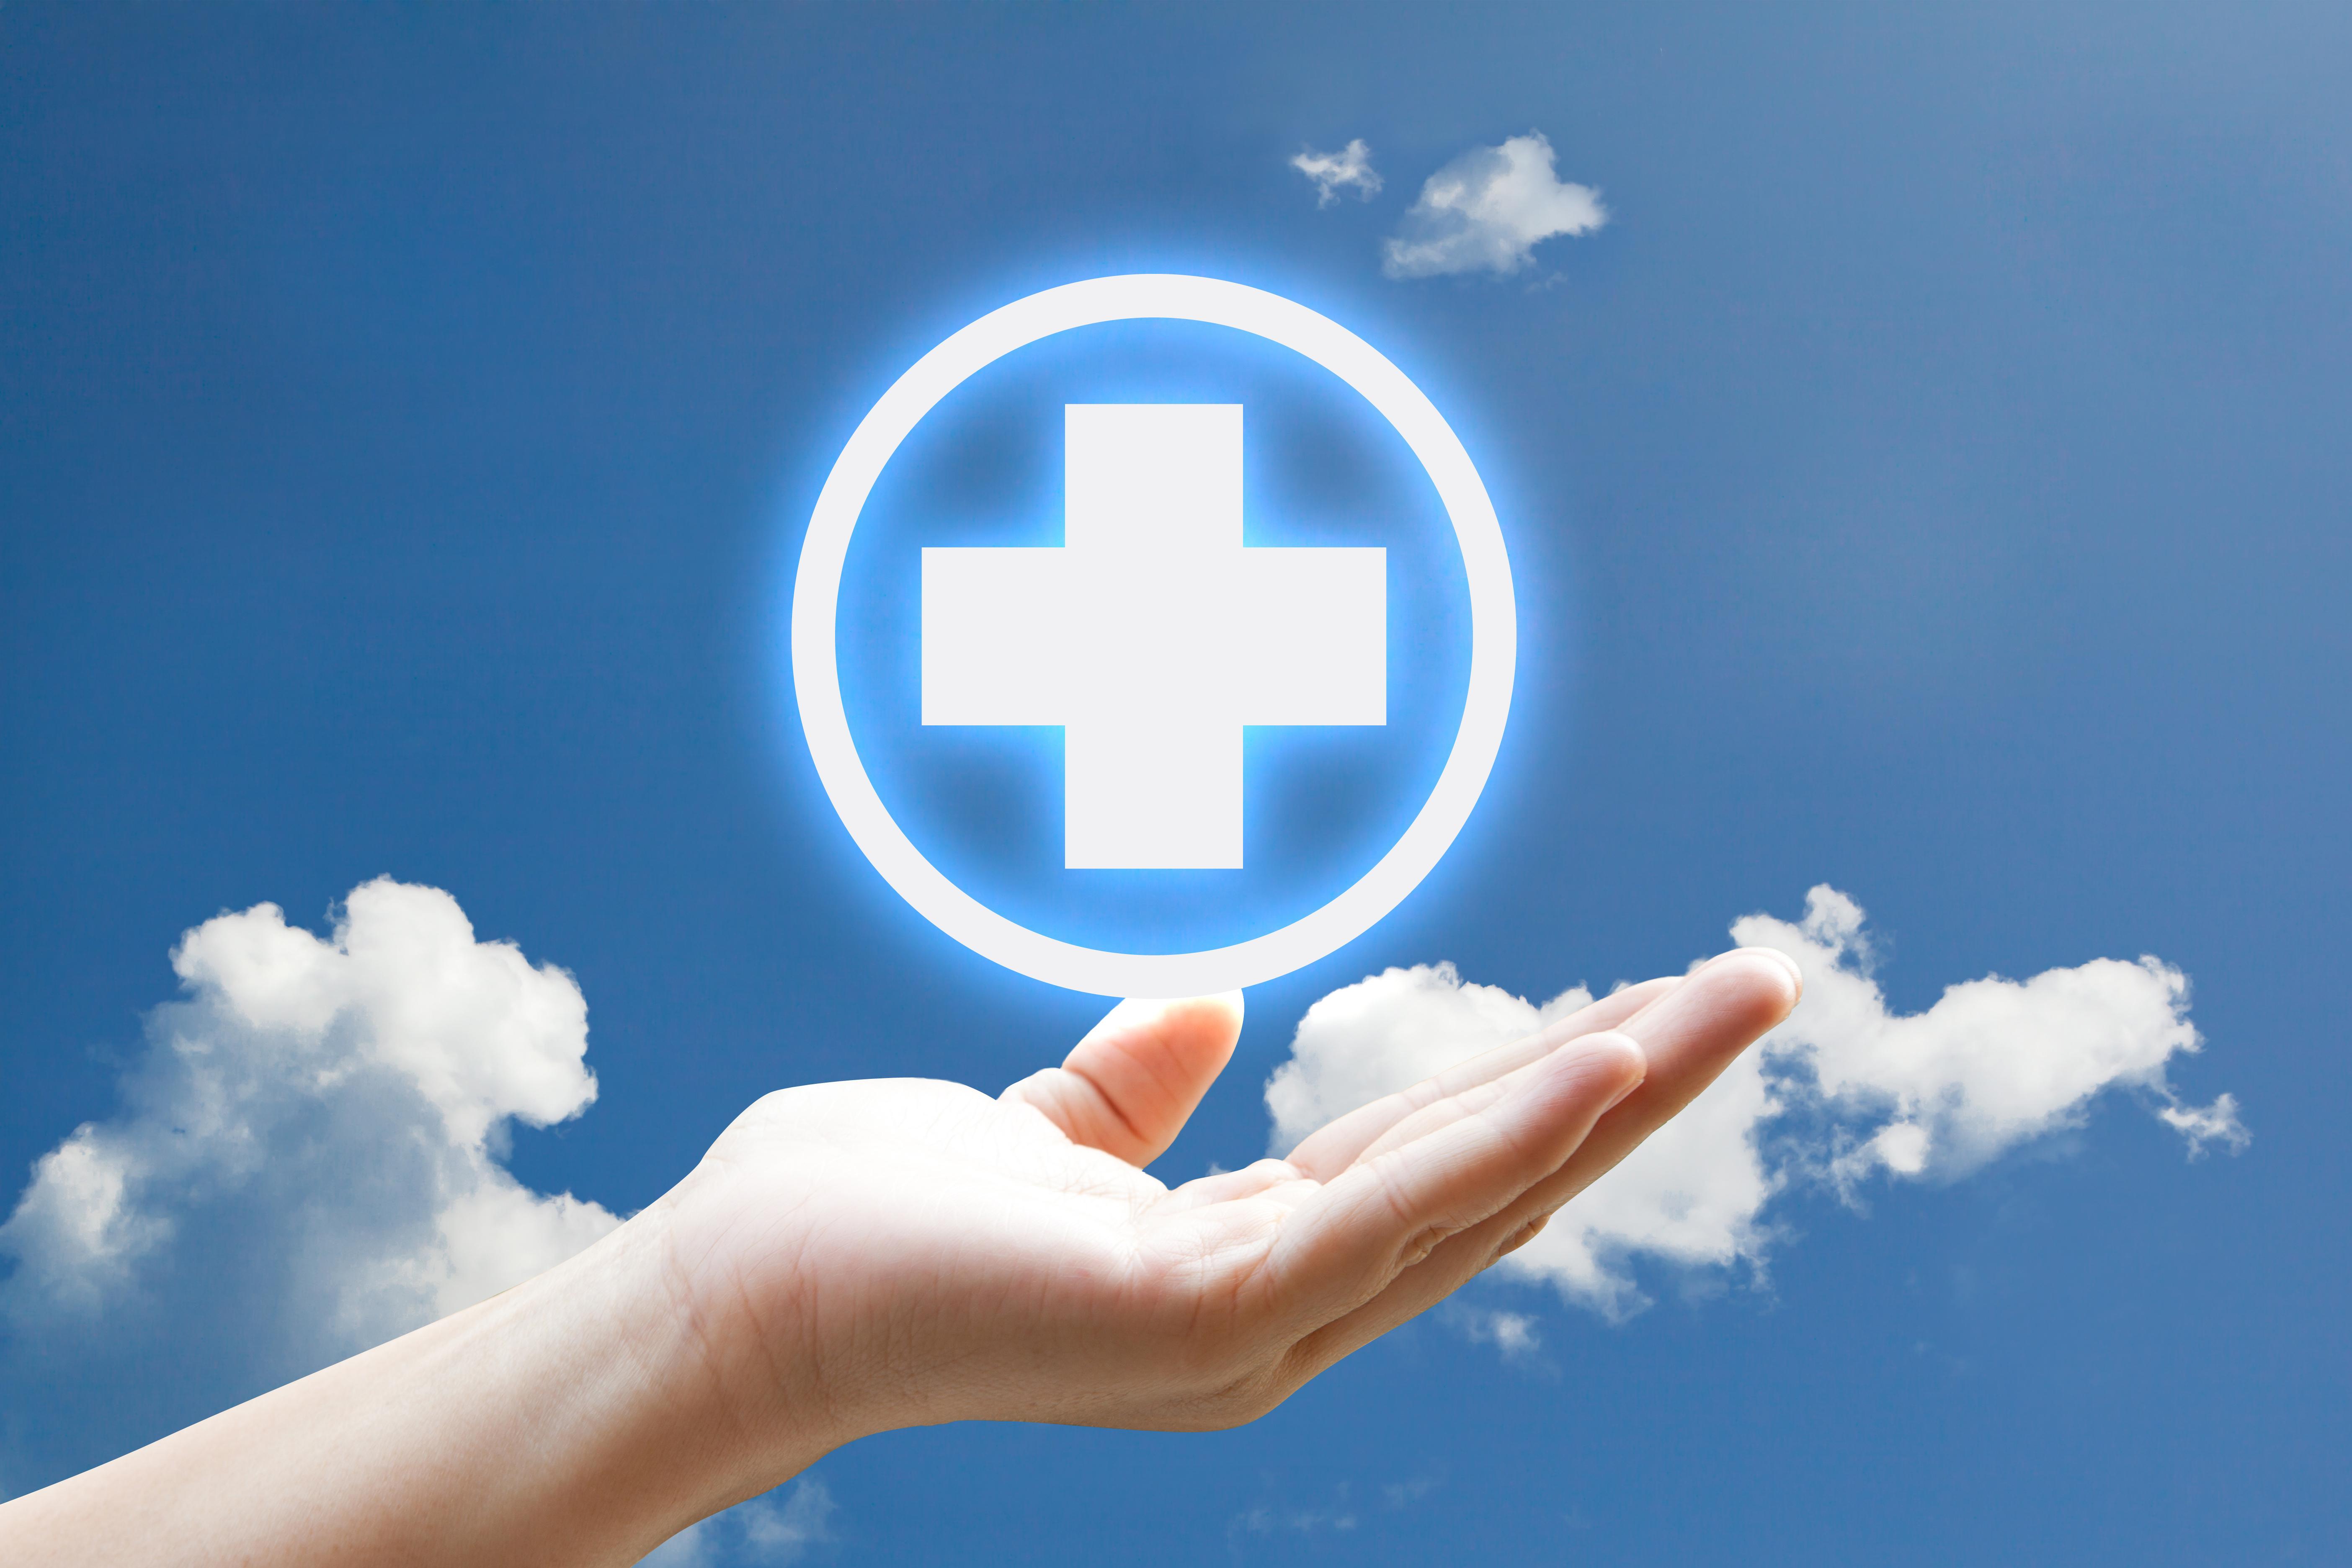 healthcare-pr.jpg (5616×3744)